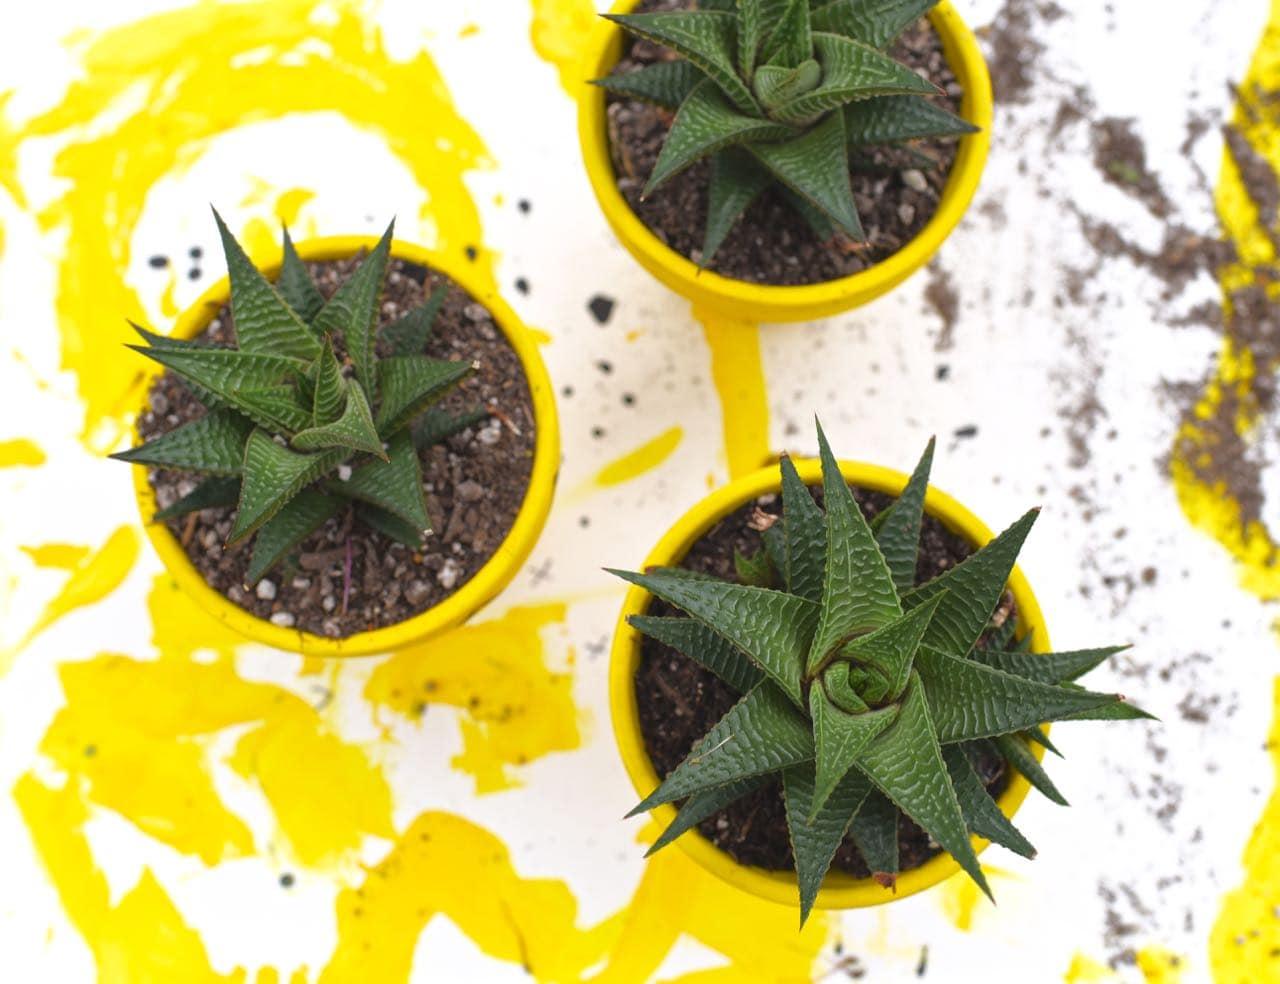 DIY pineapple planters craft